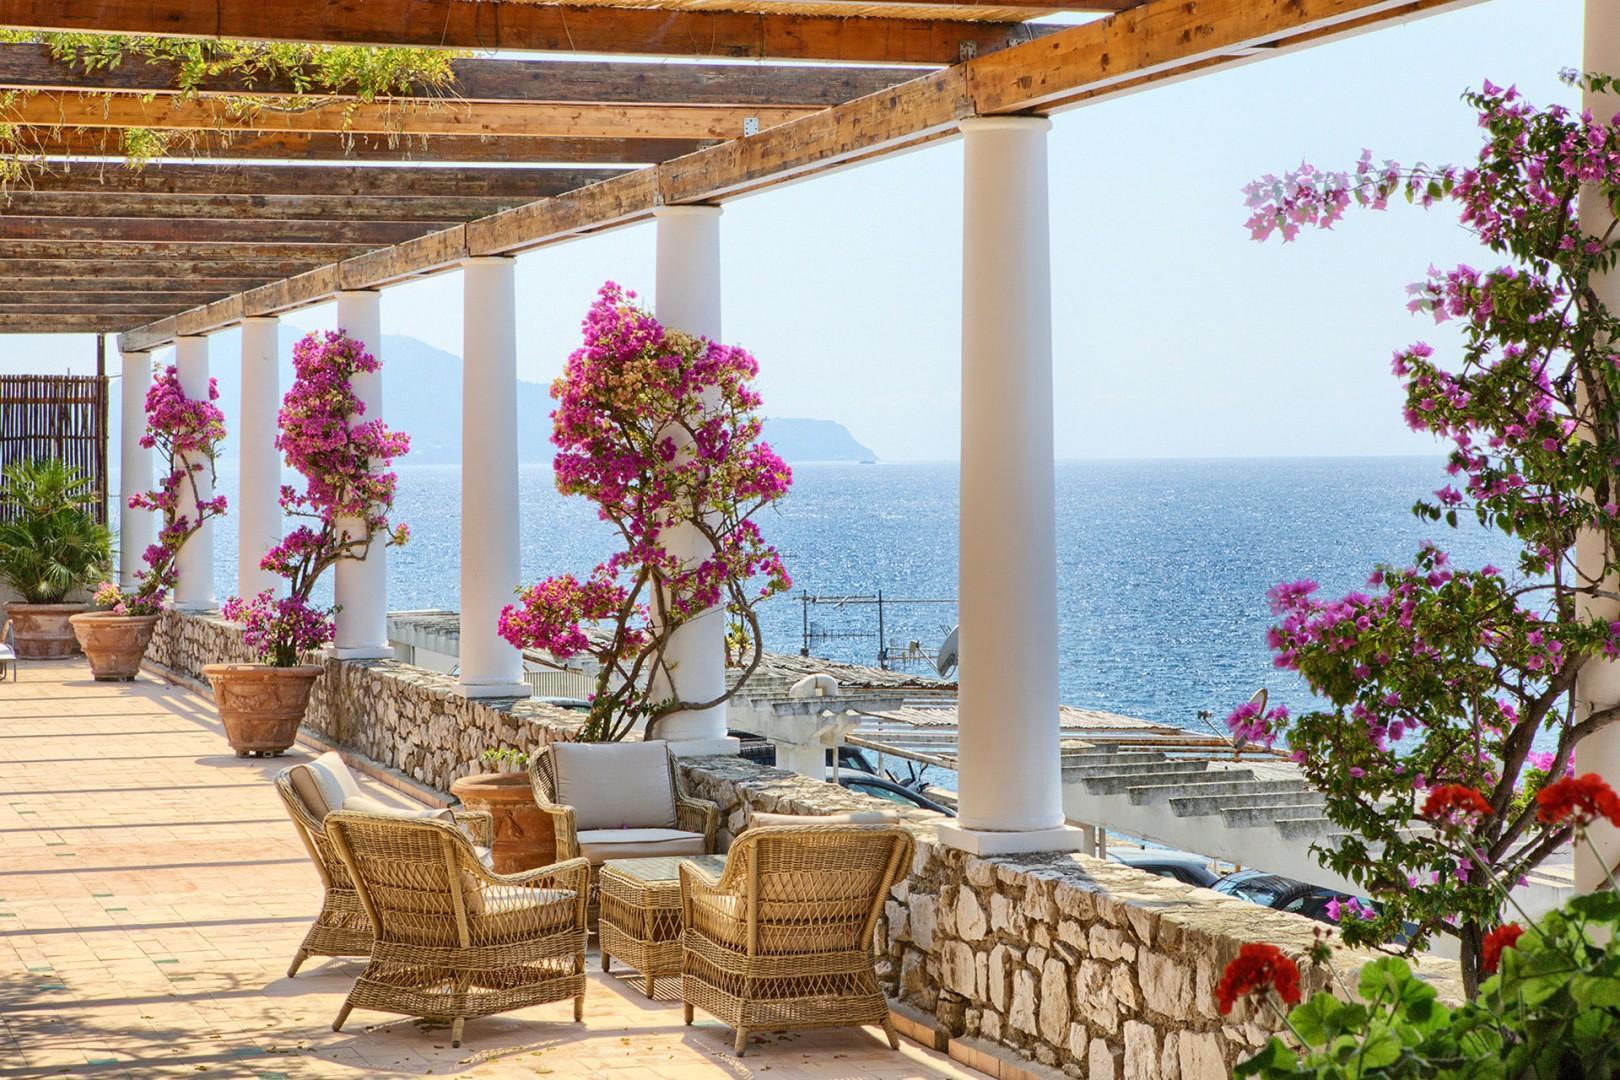 The large terrace of Villa Mare overlooks the beautiful Mediterranean sea.